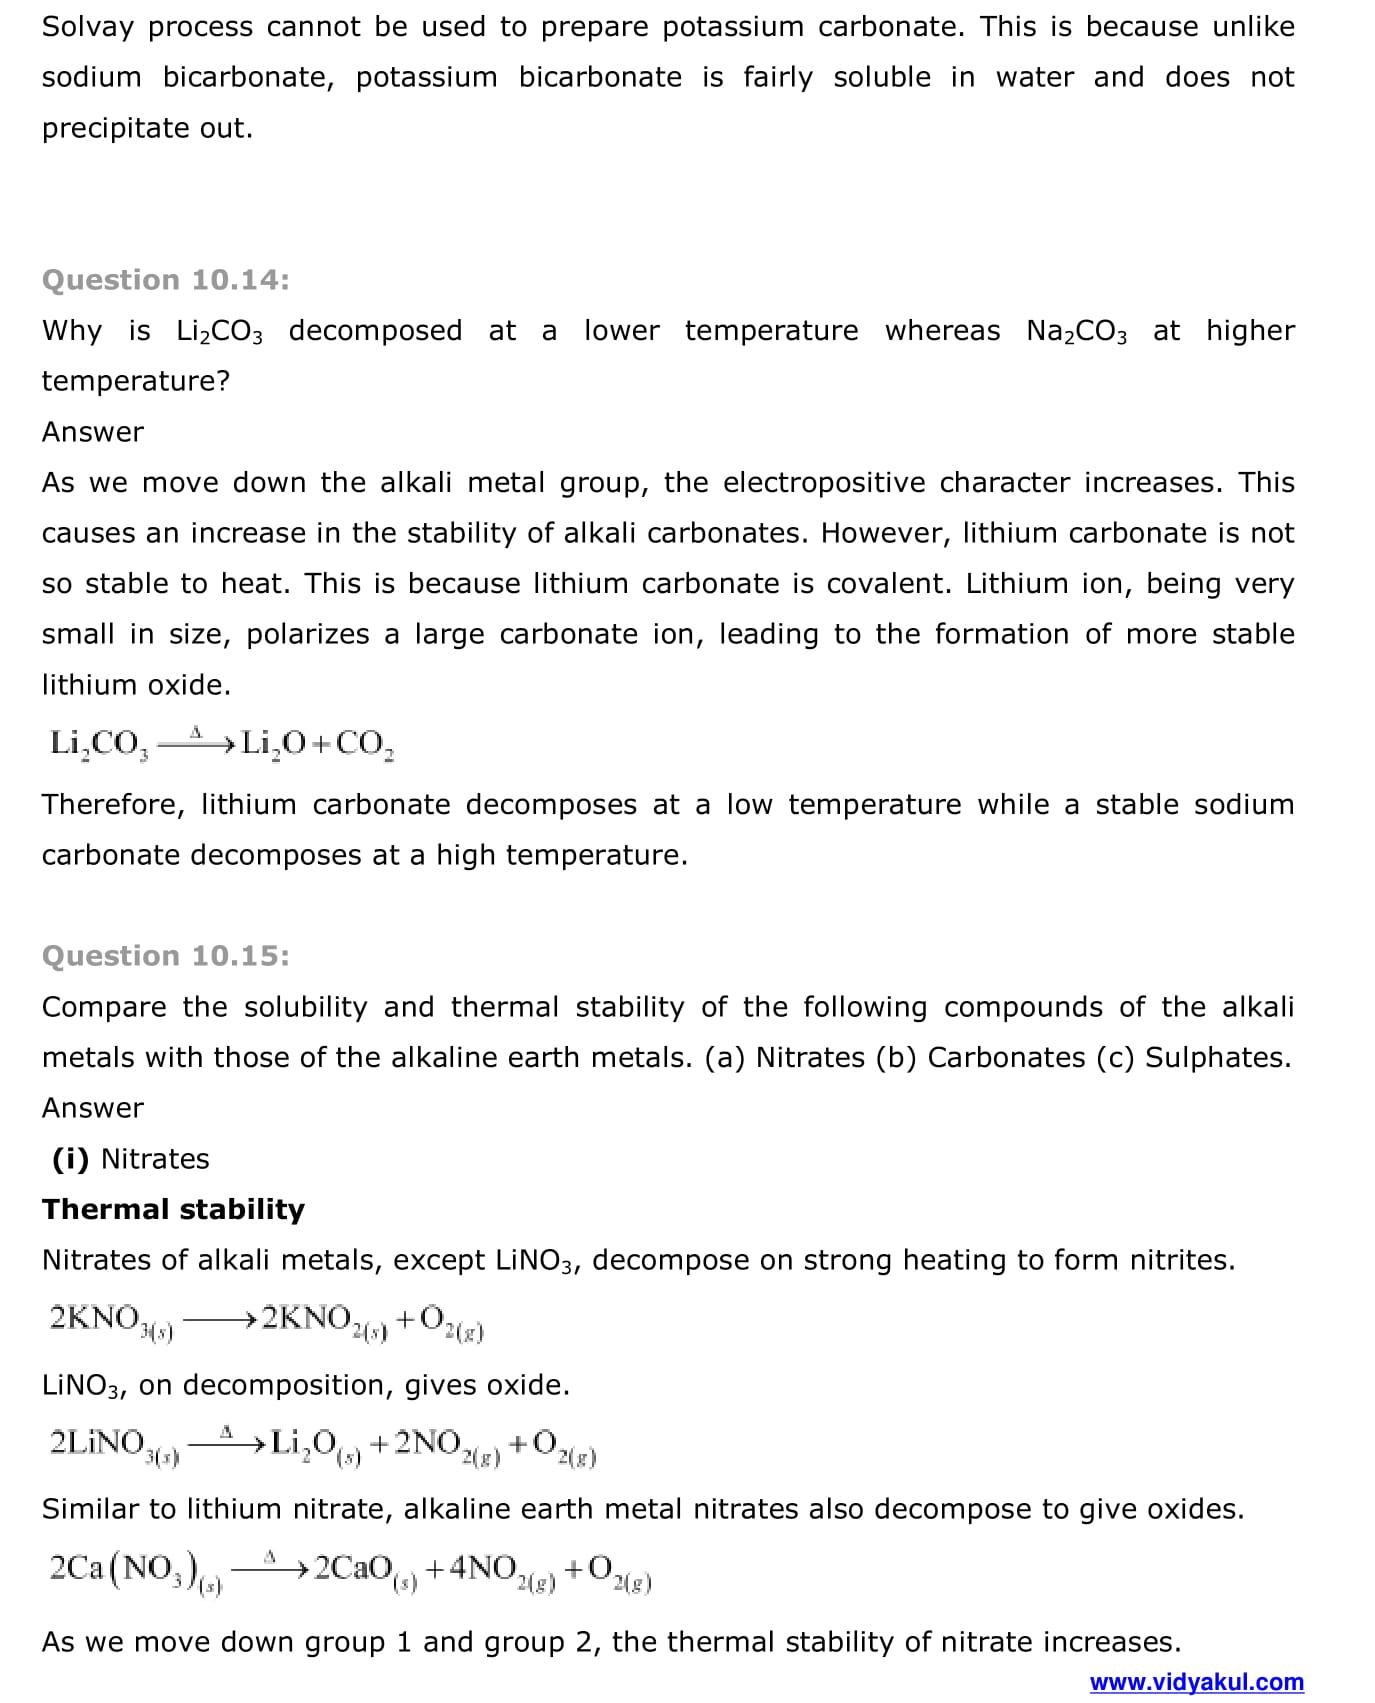 NCERT Solutions Class 11 Chemistry Chapter 10 | Vidyakul